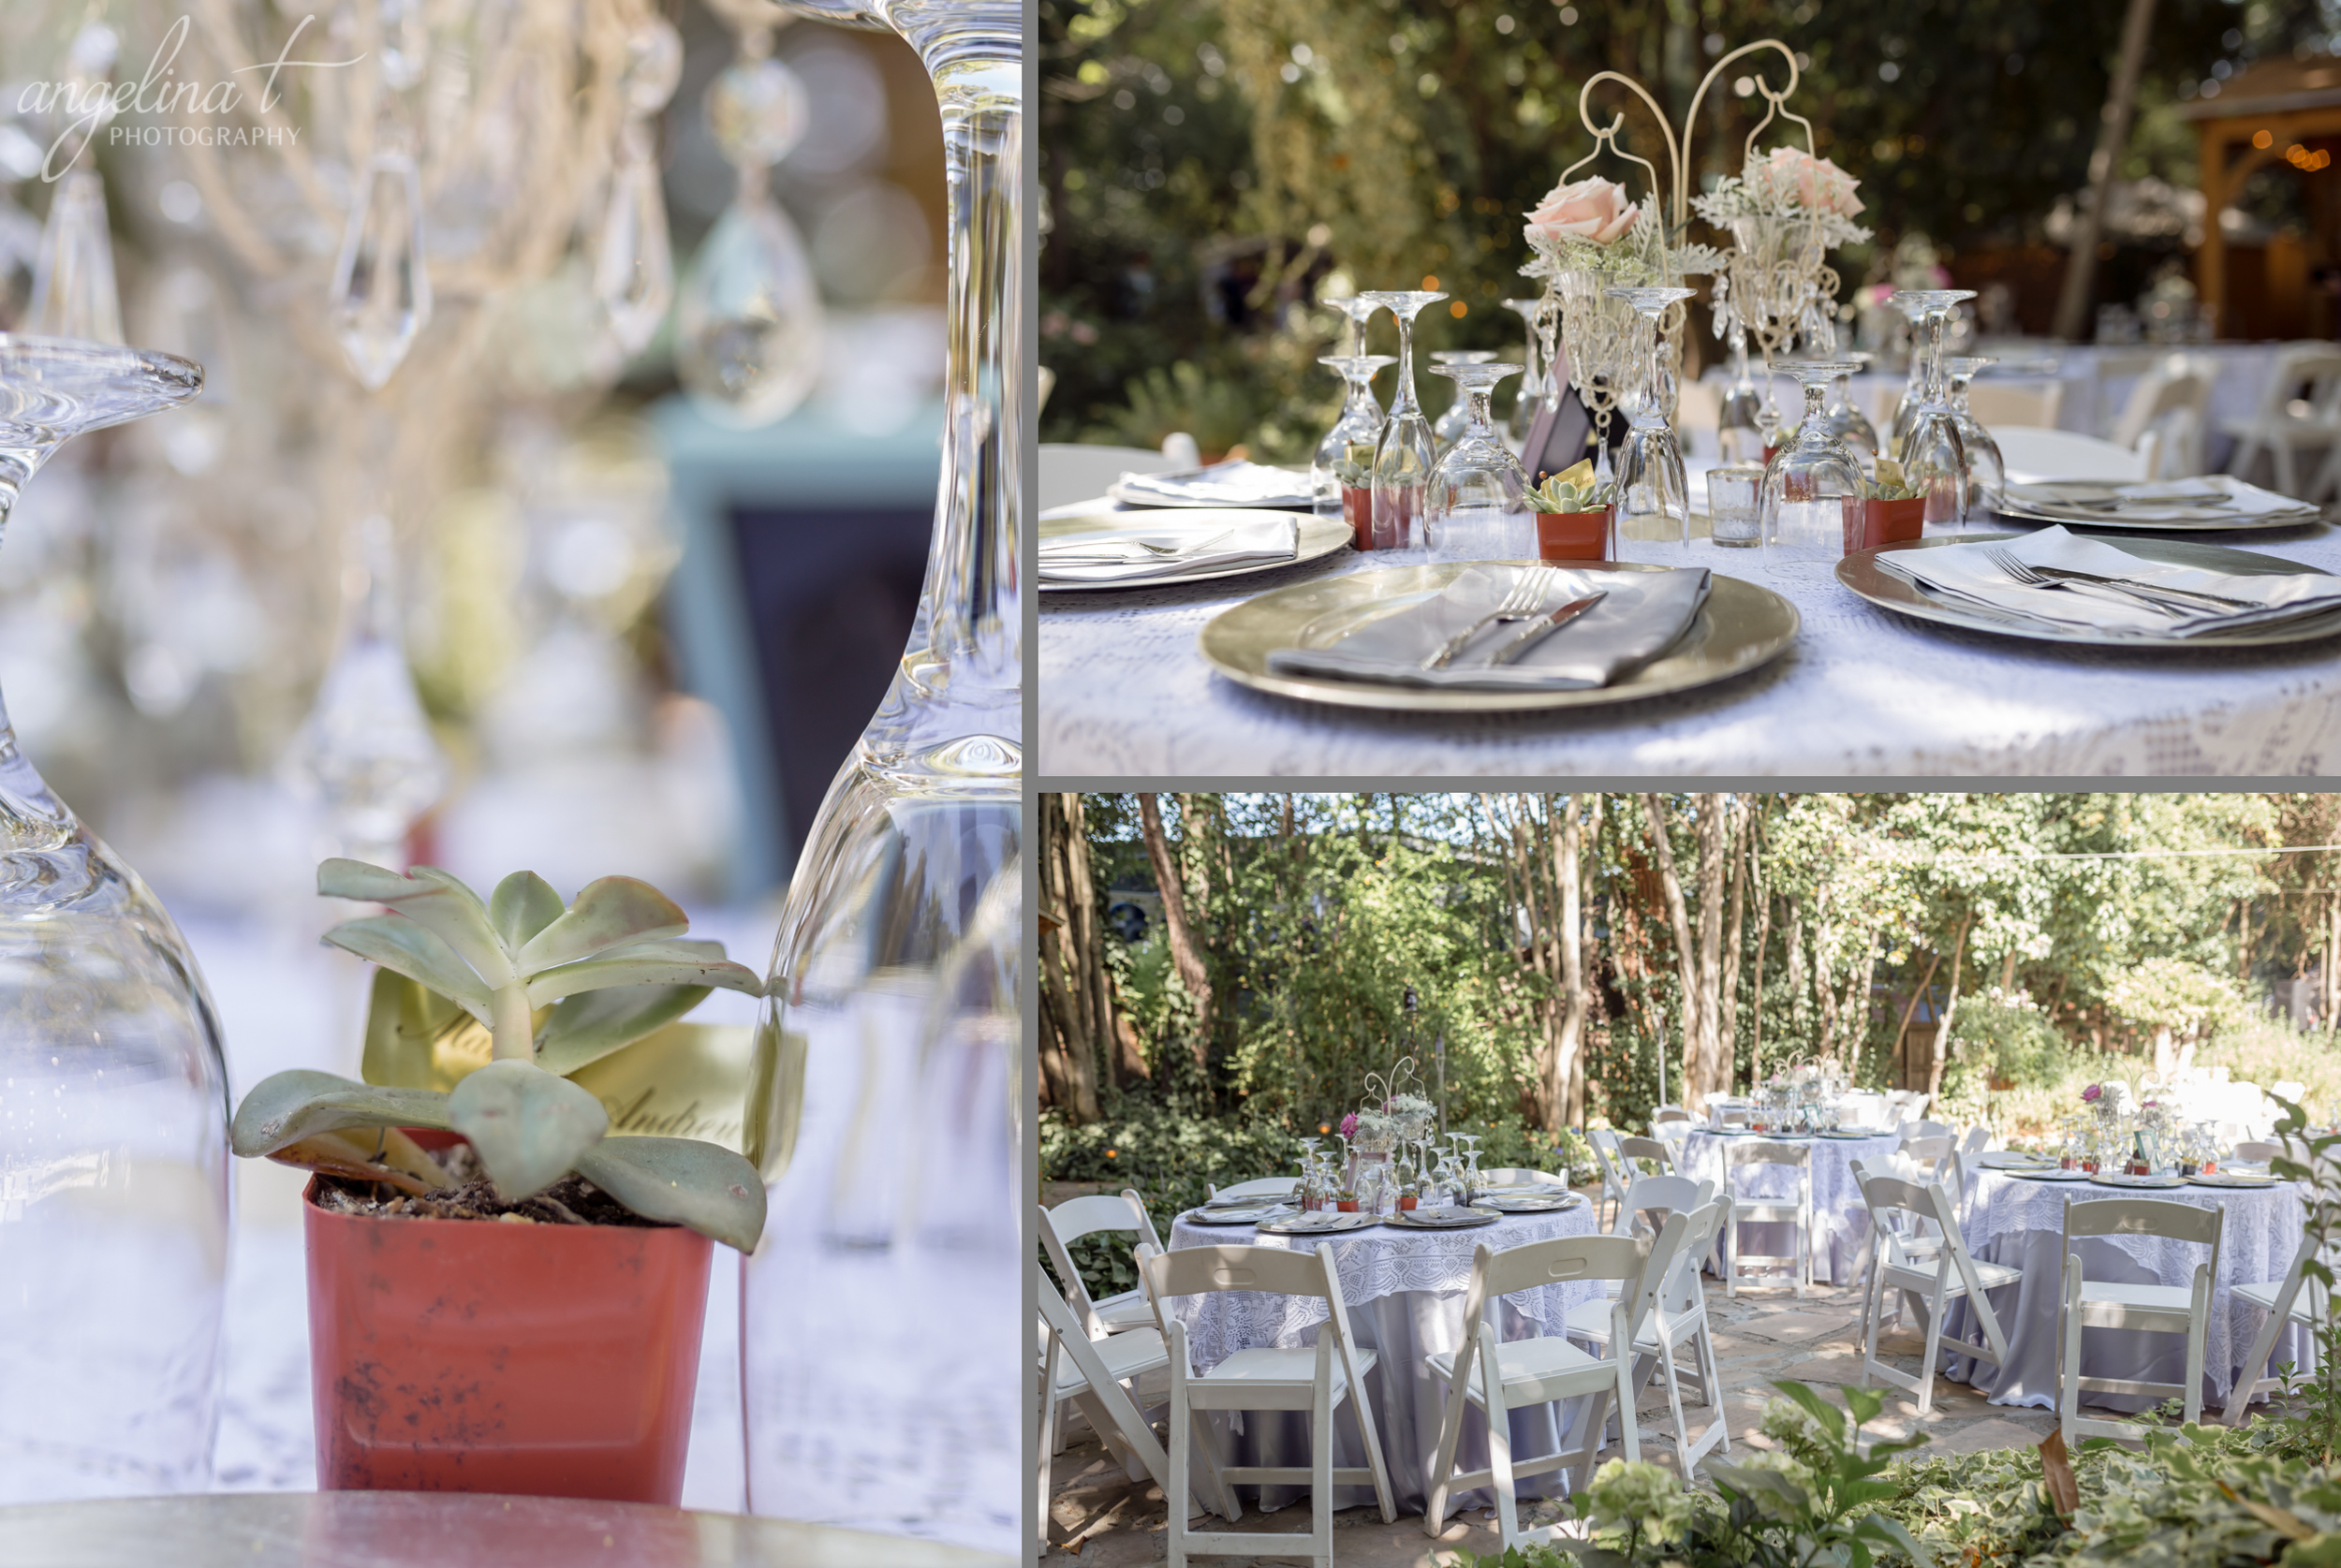 Heirloom-Inn-Garden-Wedding-Photography-Ione-97.jpg